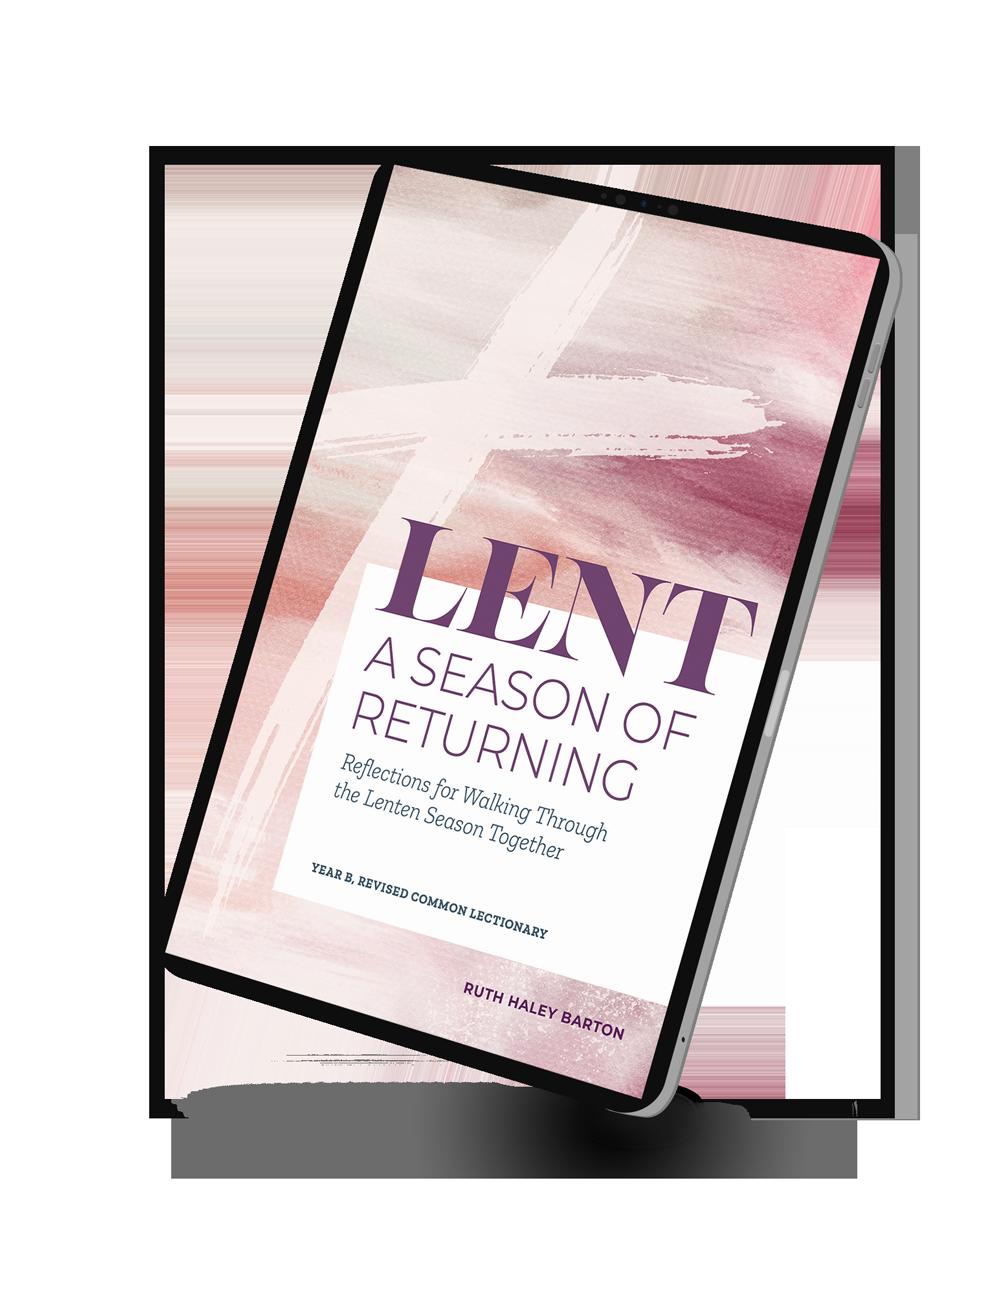 digital reader showing Lent: A Season of Returning cover